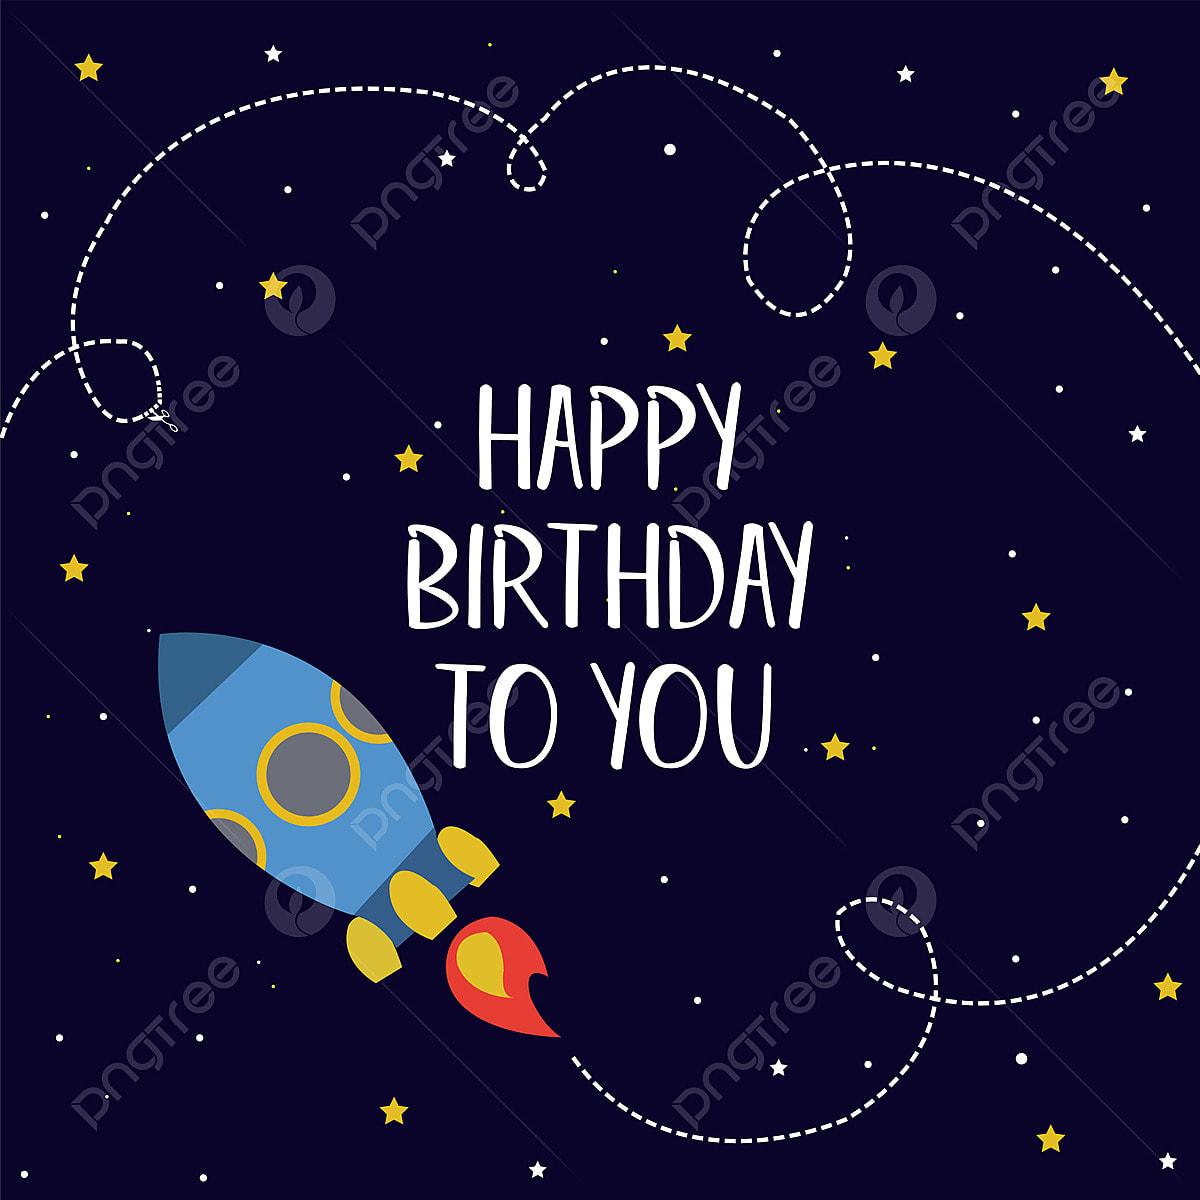 Happy Birthday Card Space Theme, Birthday, Birthday